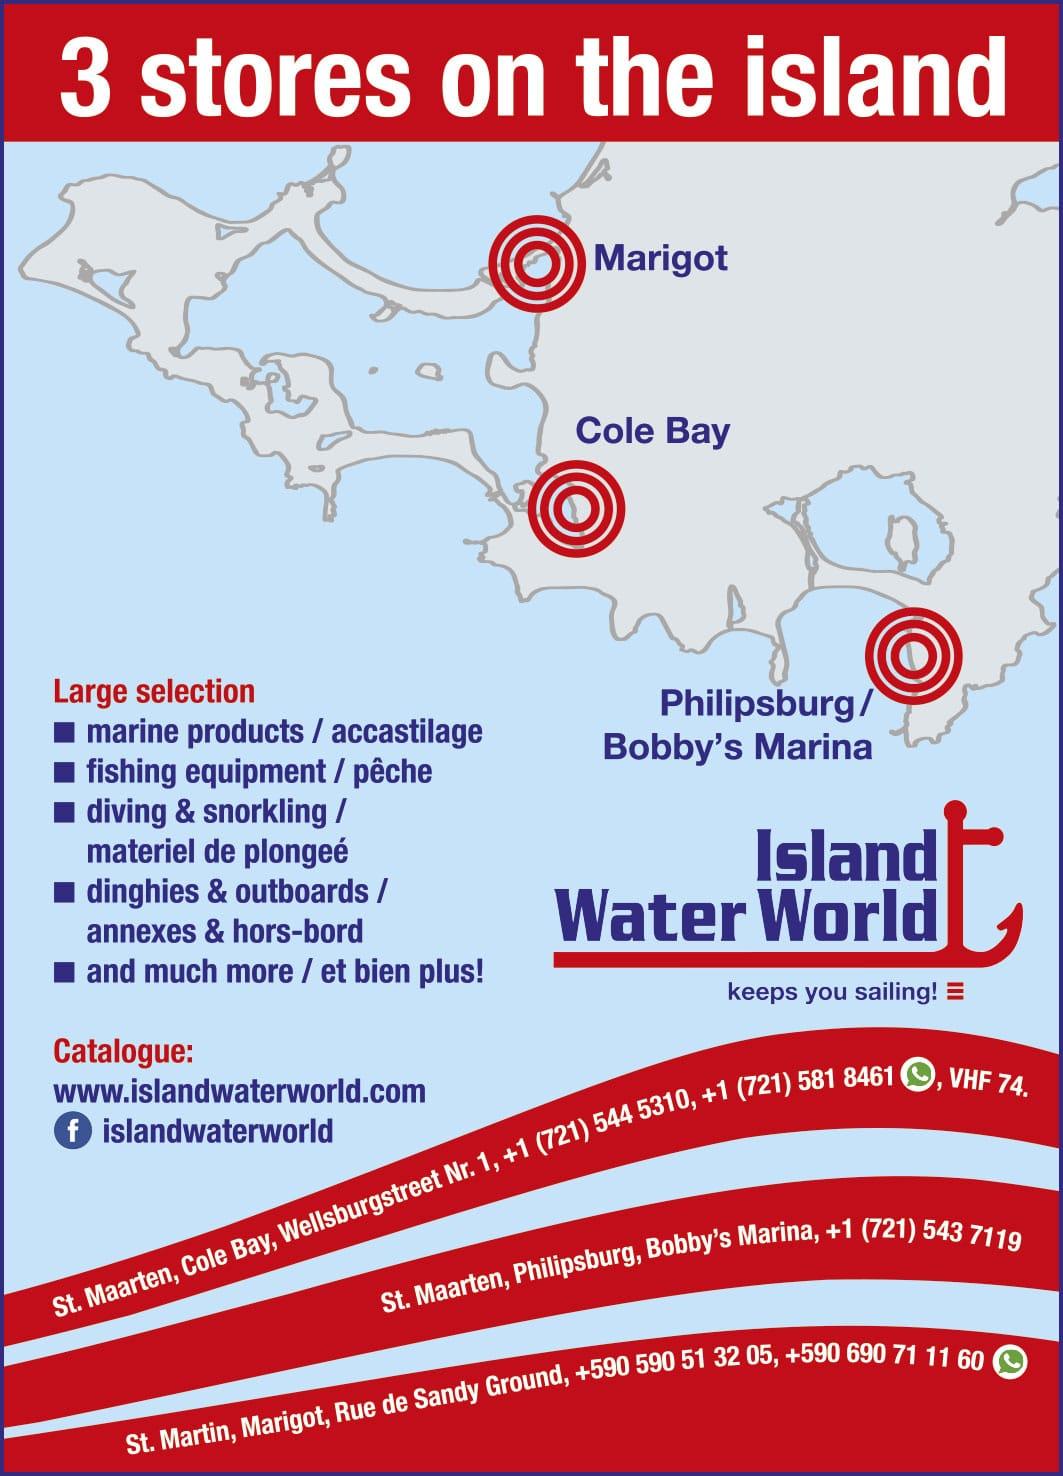 Annuaire Téléphonique St Martin - Island Water World